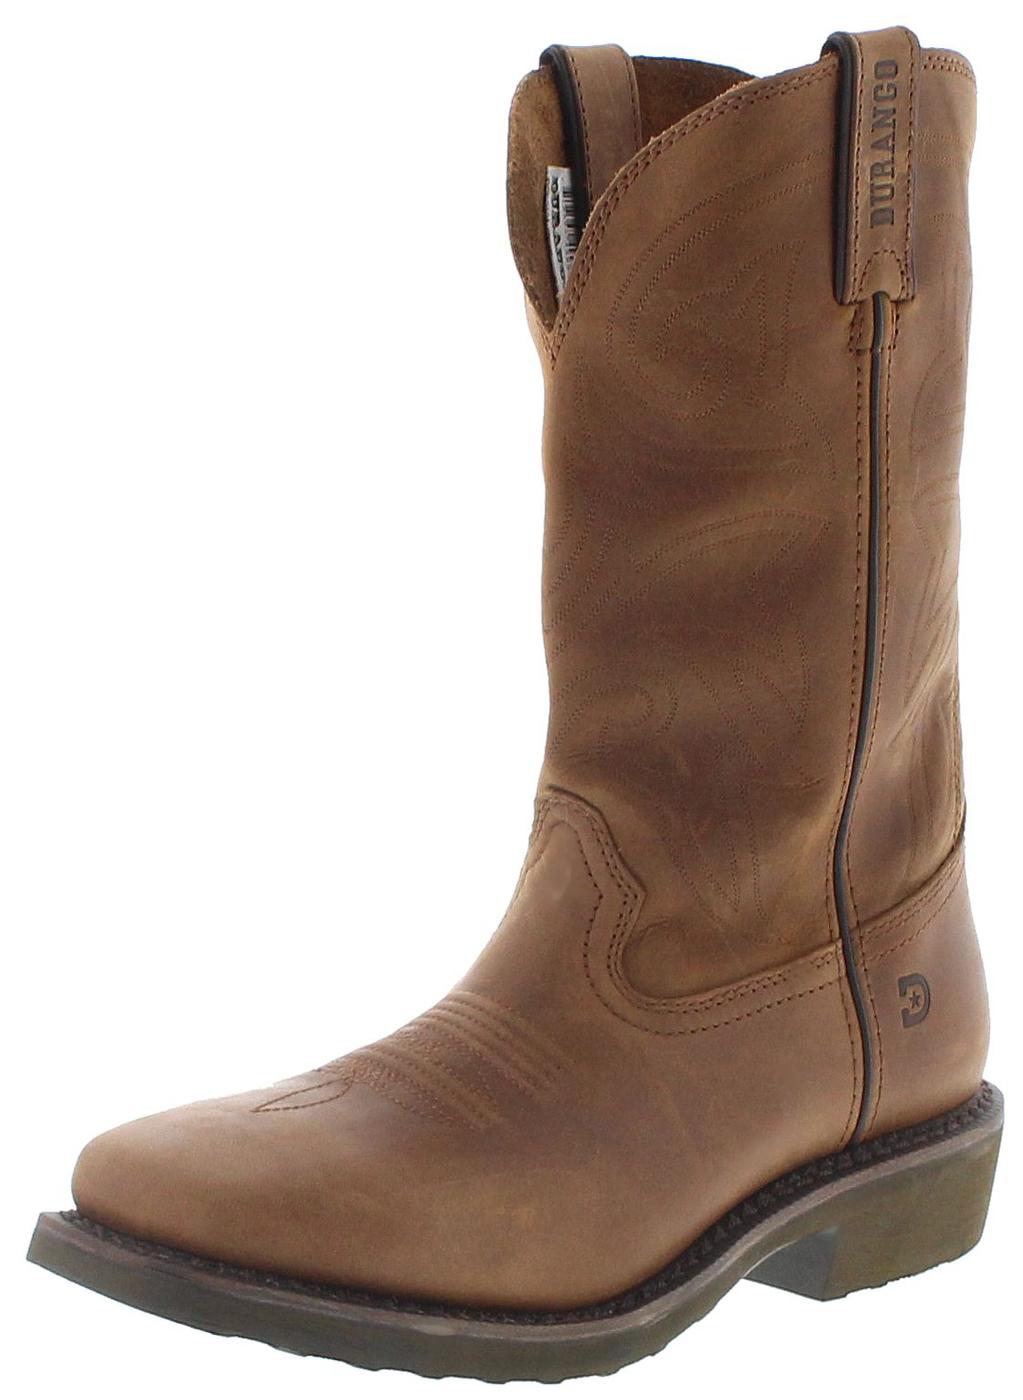 Durango Boots PULL-ON DDB0101 M Brown Ranch Stiefel - braun